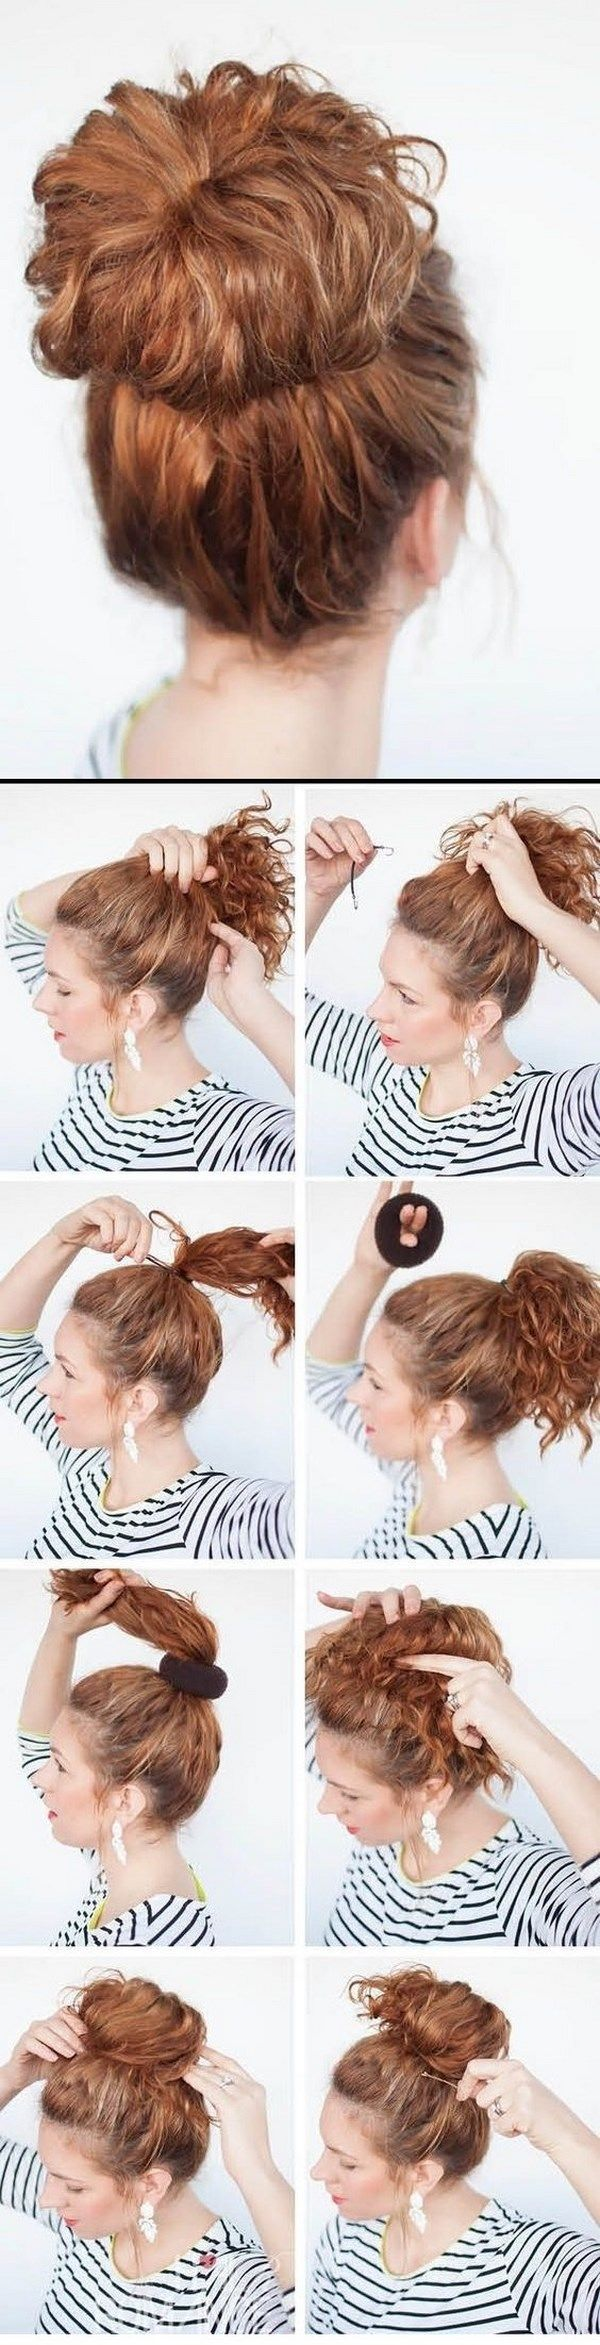 32 Peinados Faciles Y Rapidos Paso A Paso Modelos 2018 Varios